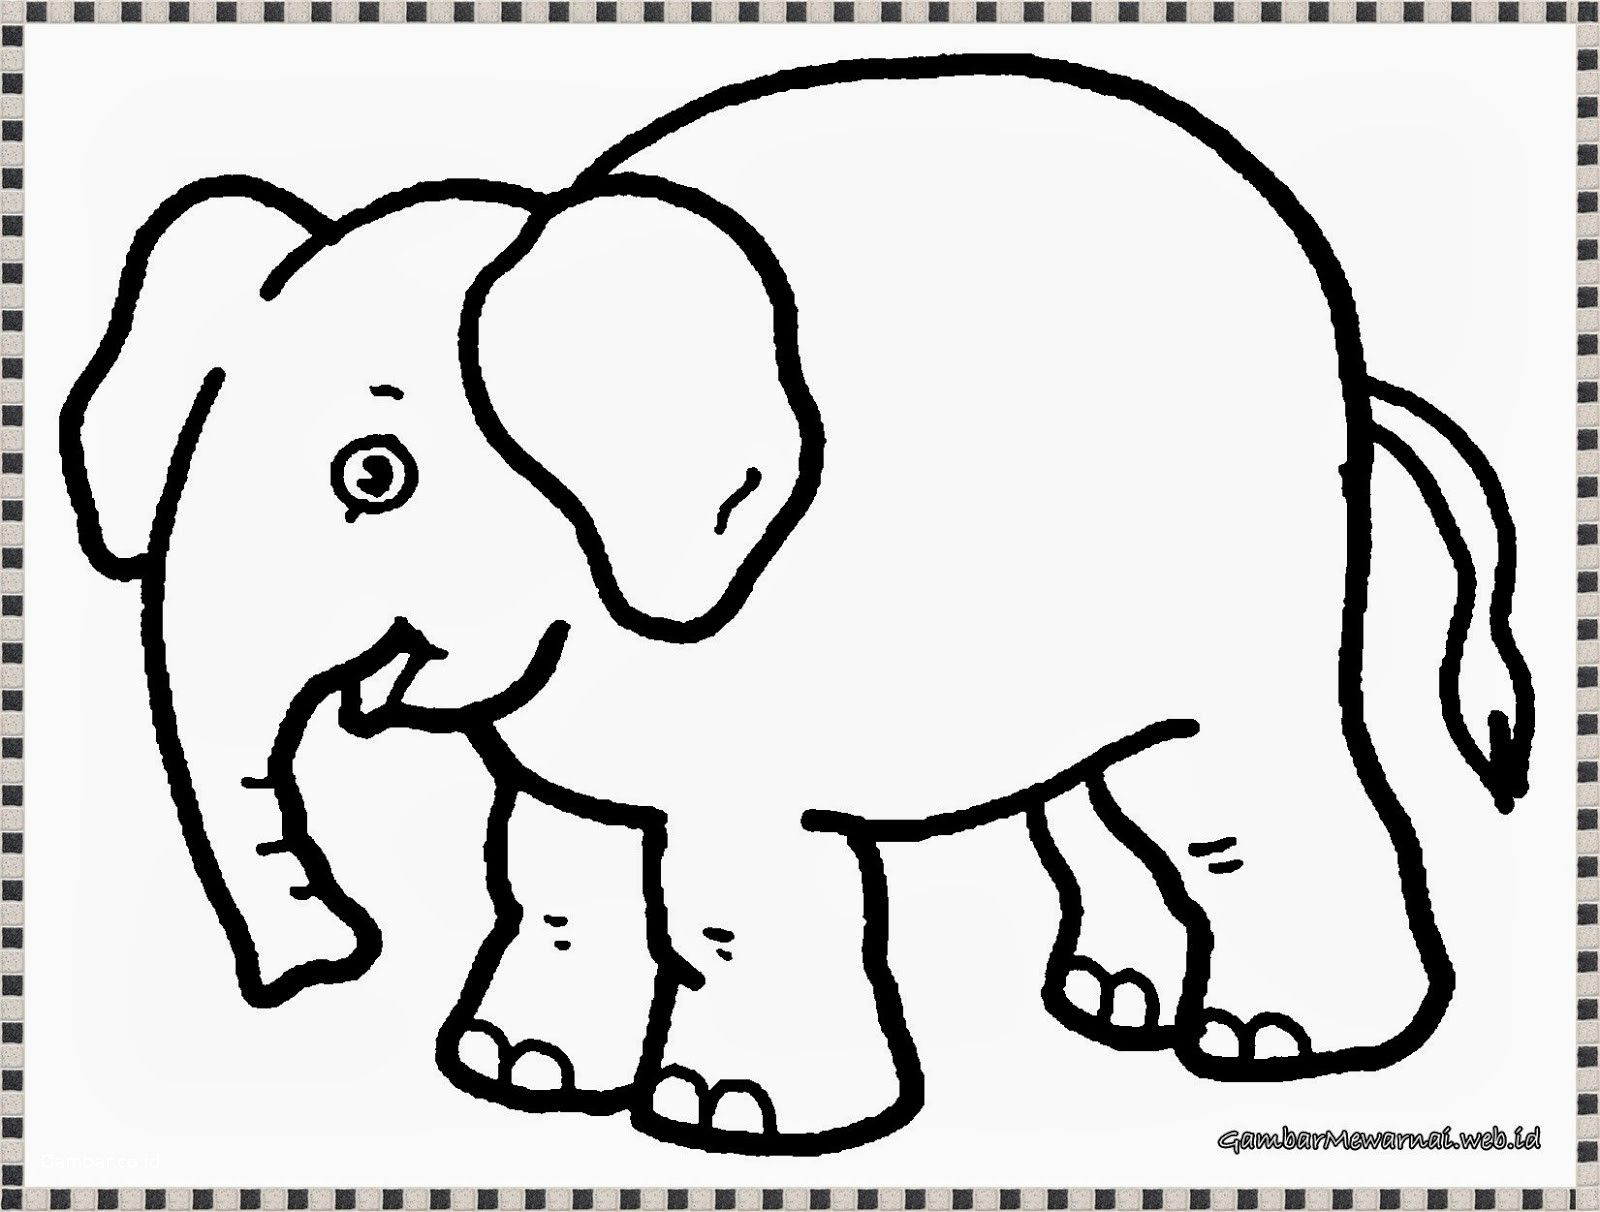 7800 Koleksi Kolase Binatang Gajah Terbaru